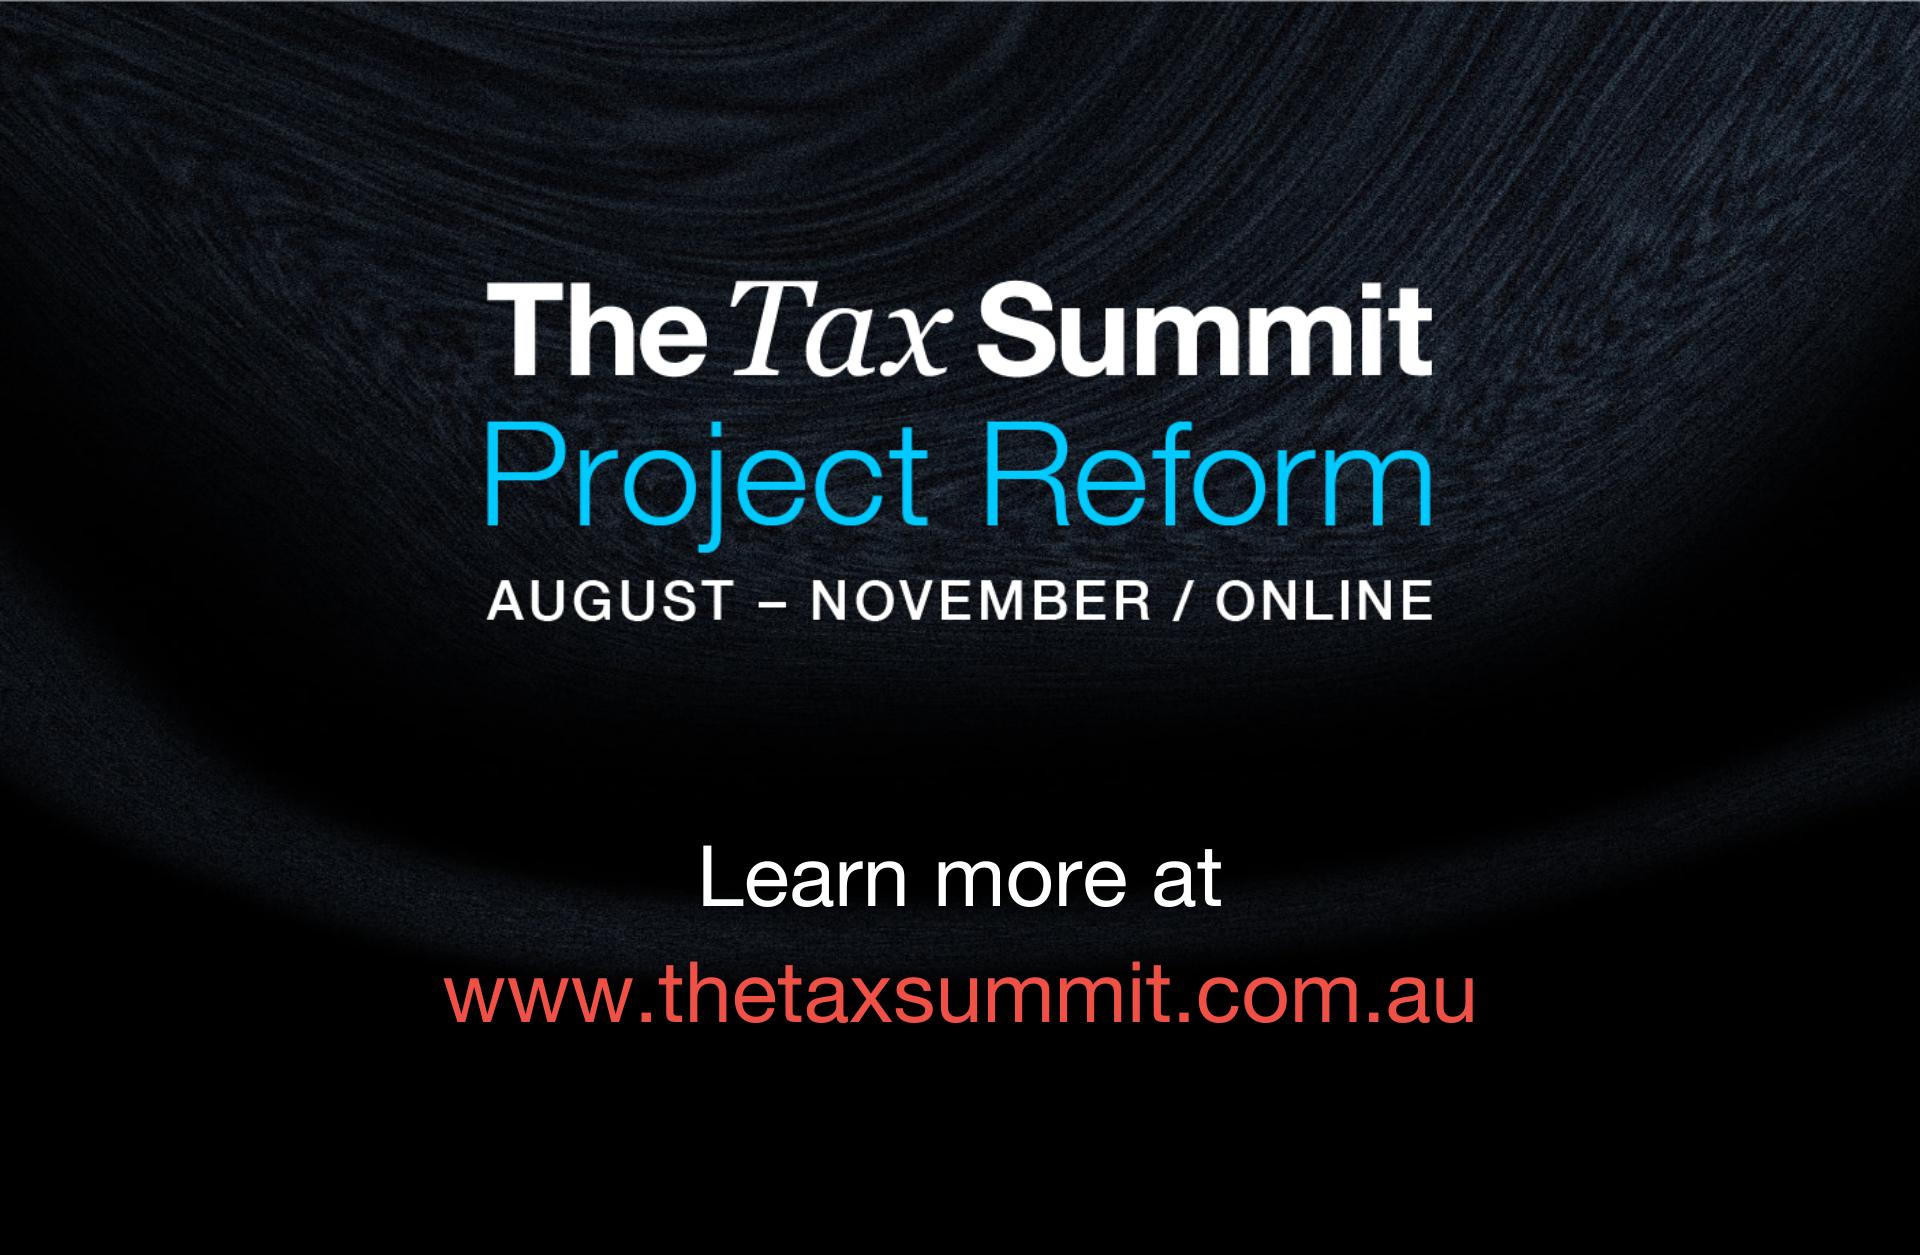 Project-Reform-FS3-teaser